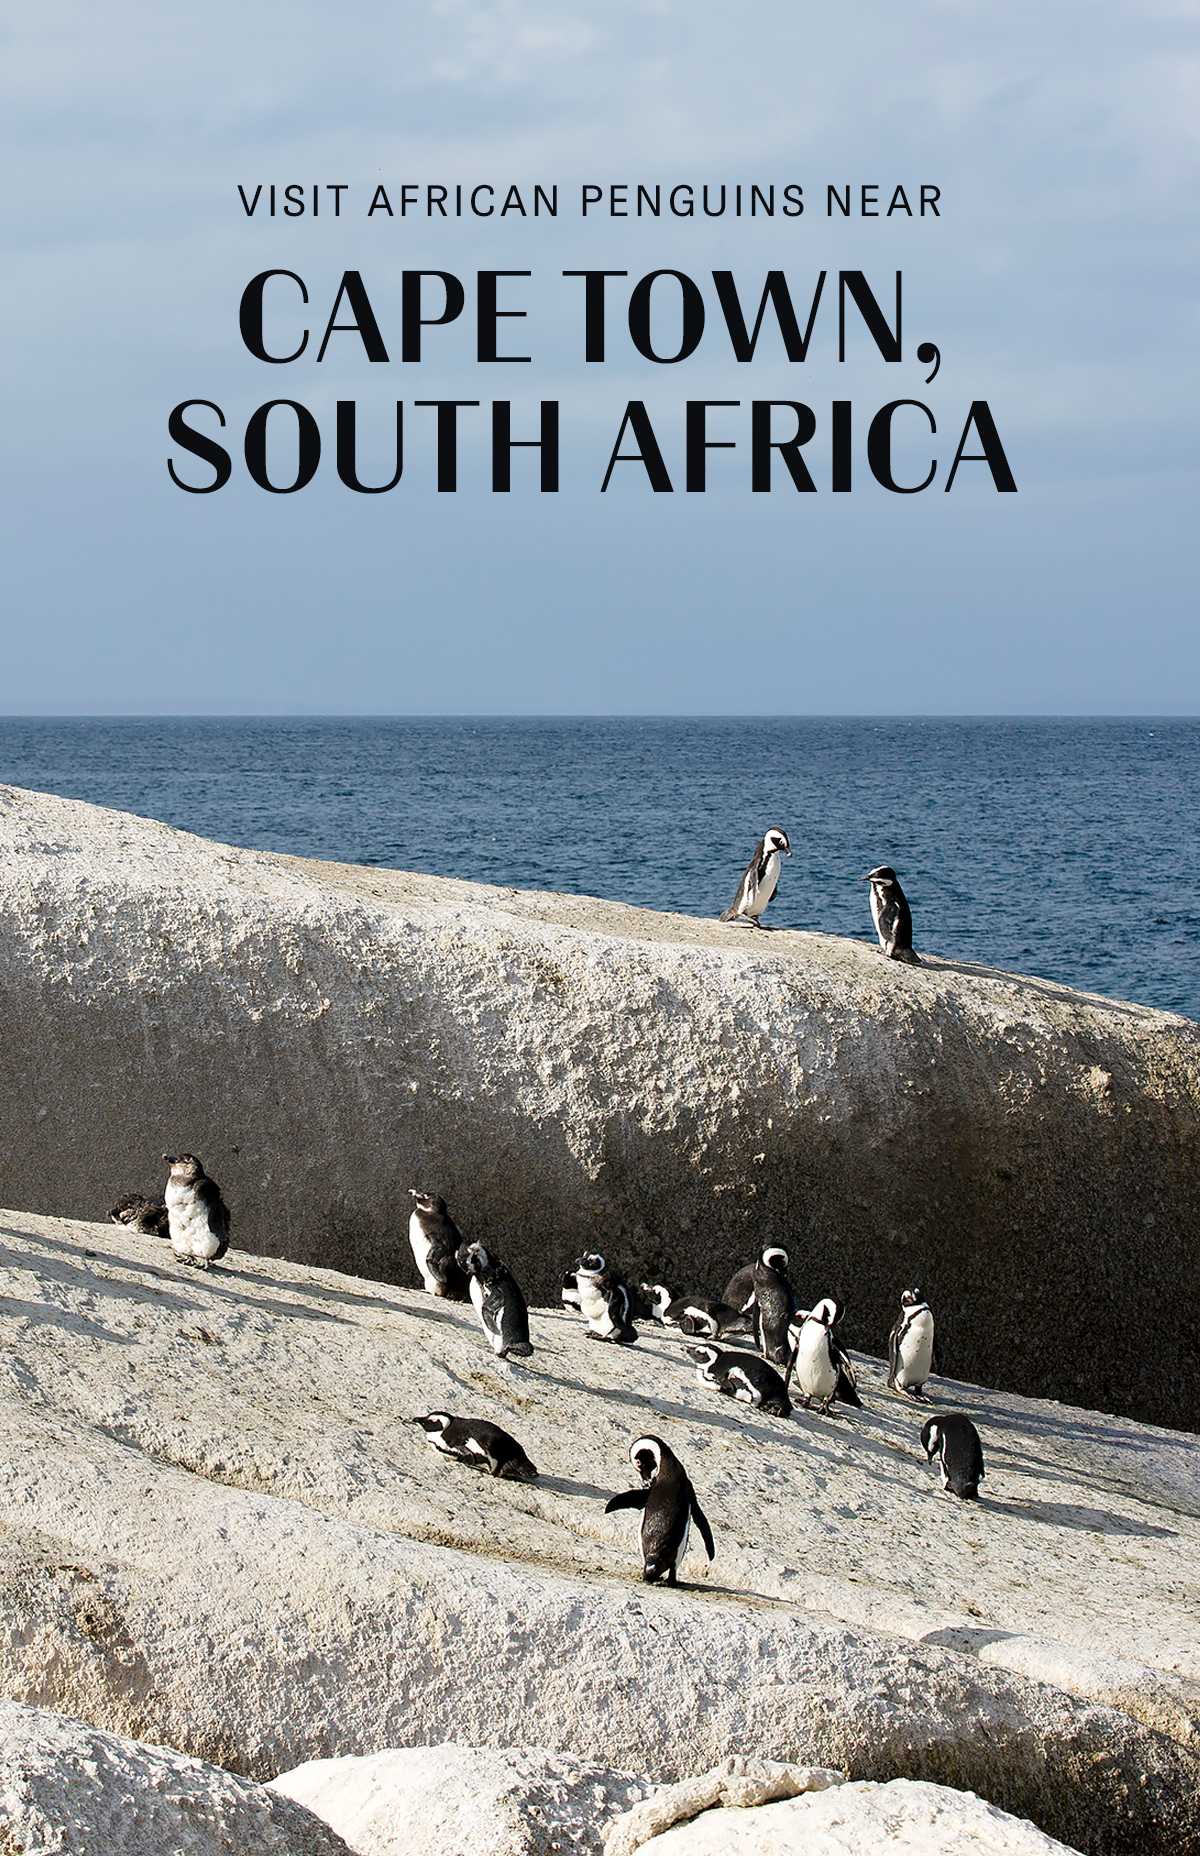 social-chrissihernandez-pin-cape-town-africanpenguins-03.jpg